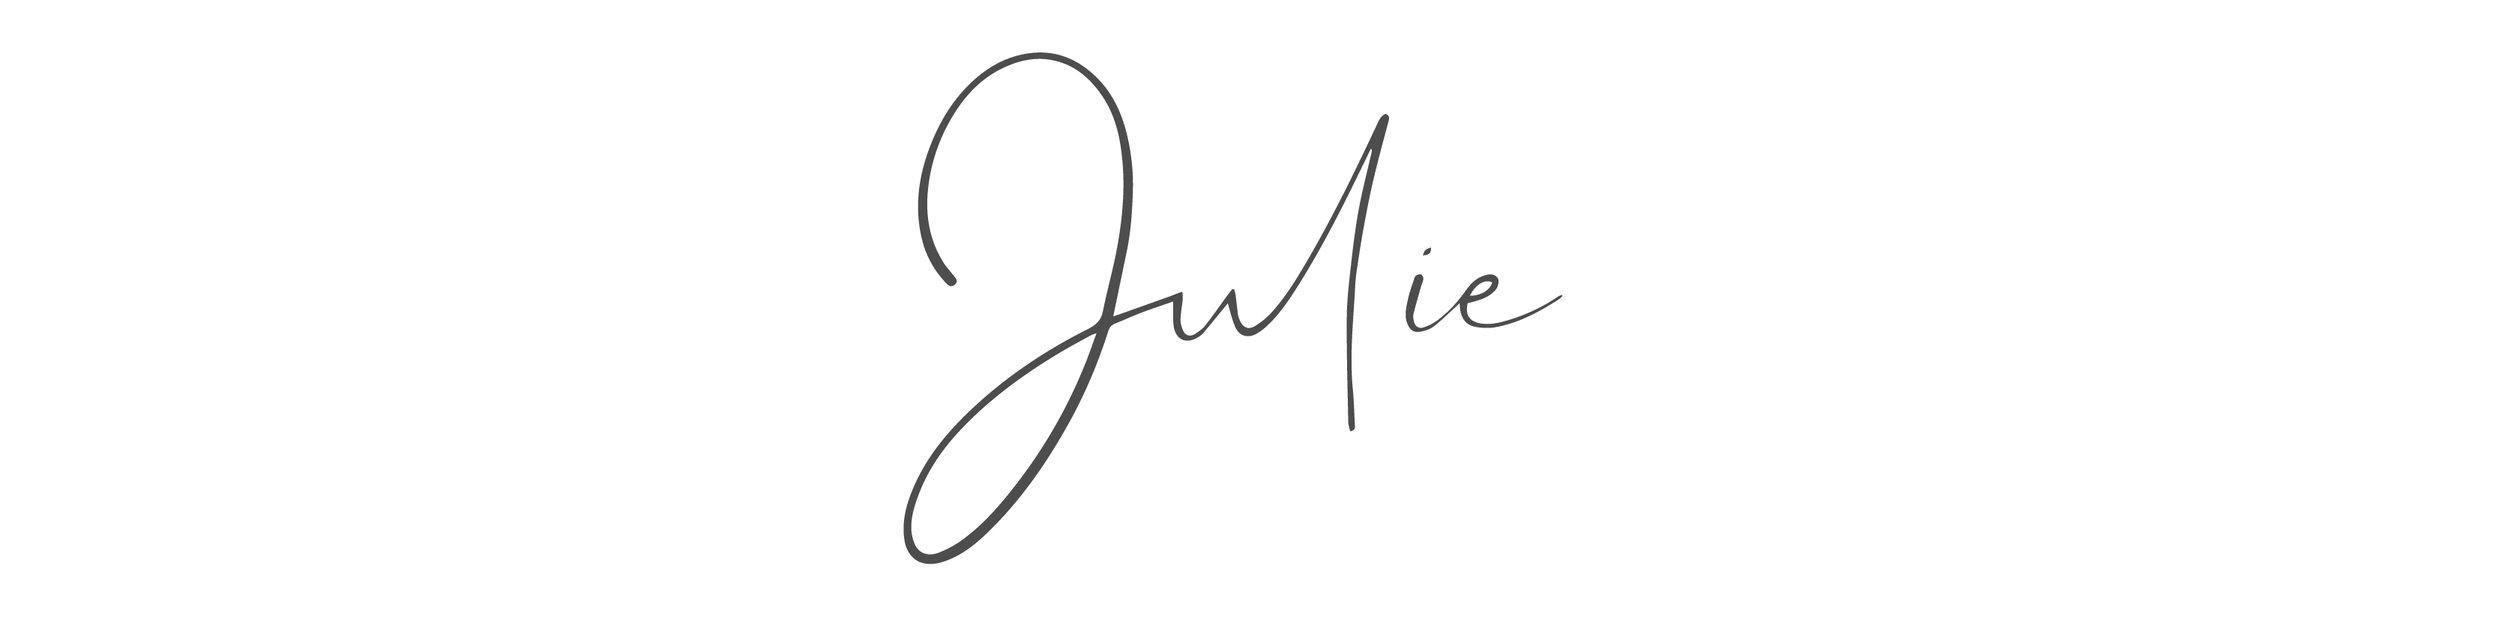 julie-signature-blog-34.jpg